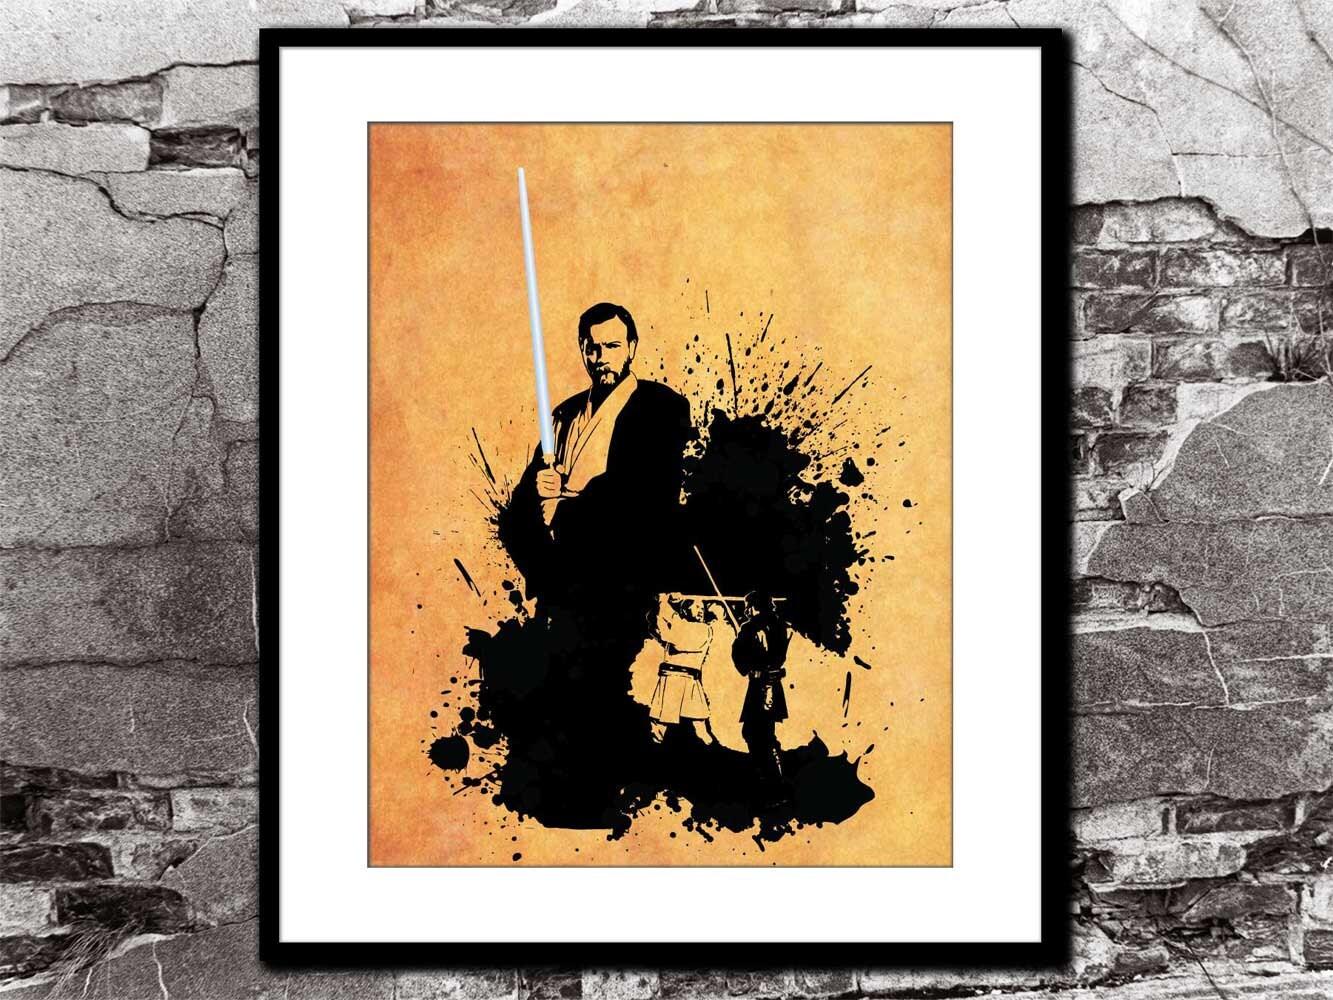 Obi Wan Kenobi Star Wars Inspired Movie Poster Minimalist